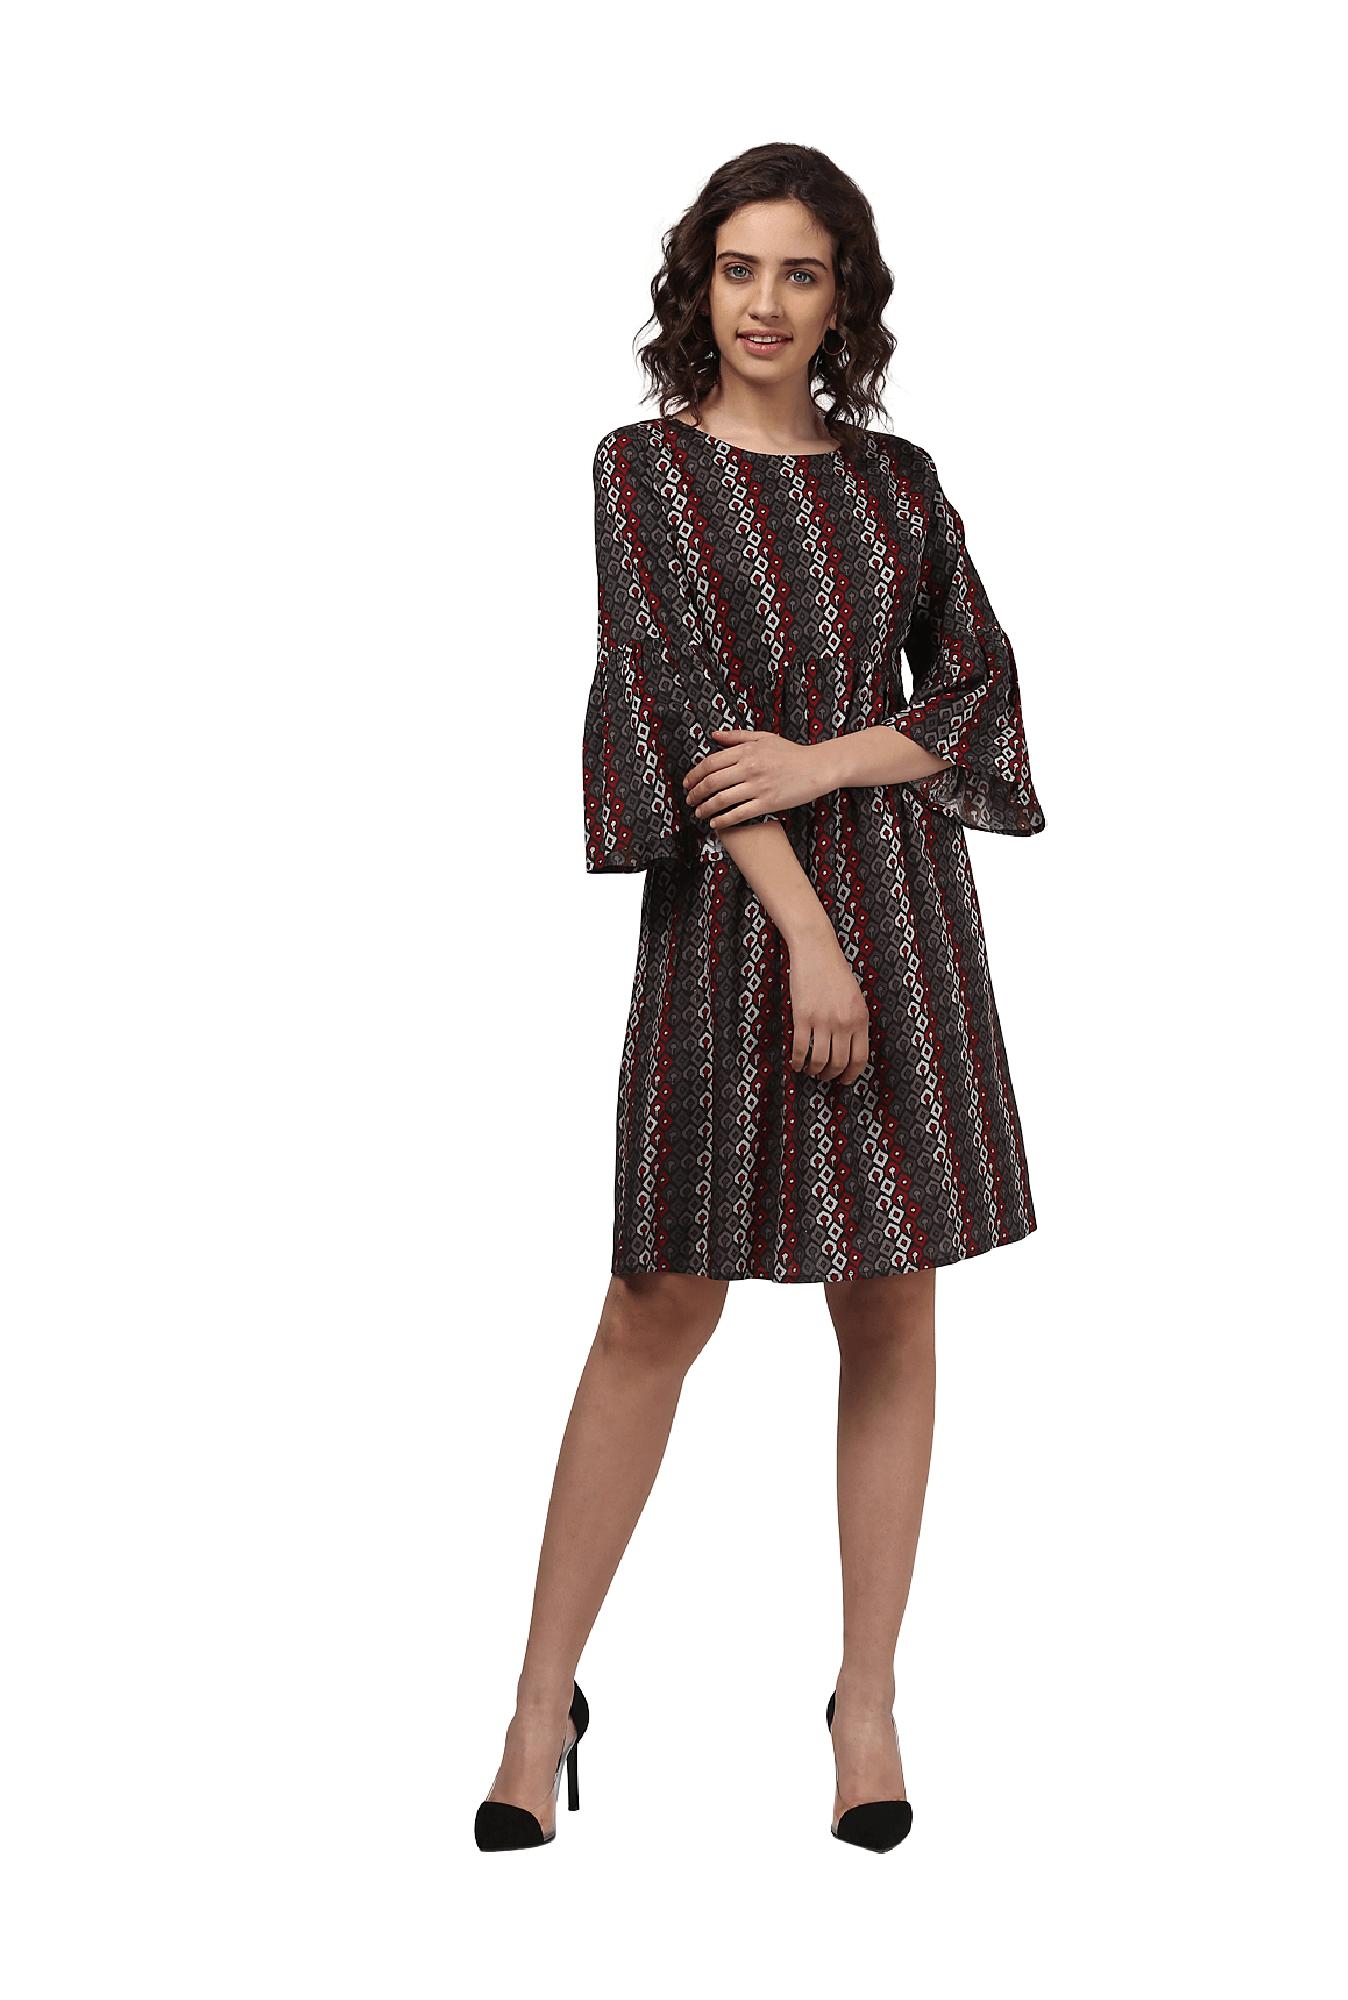 49ade4603917 Buy Harpa Brown Printed Knee Length Dress for Women Online ...